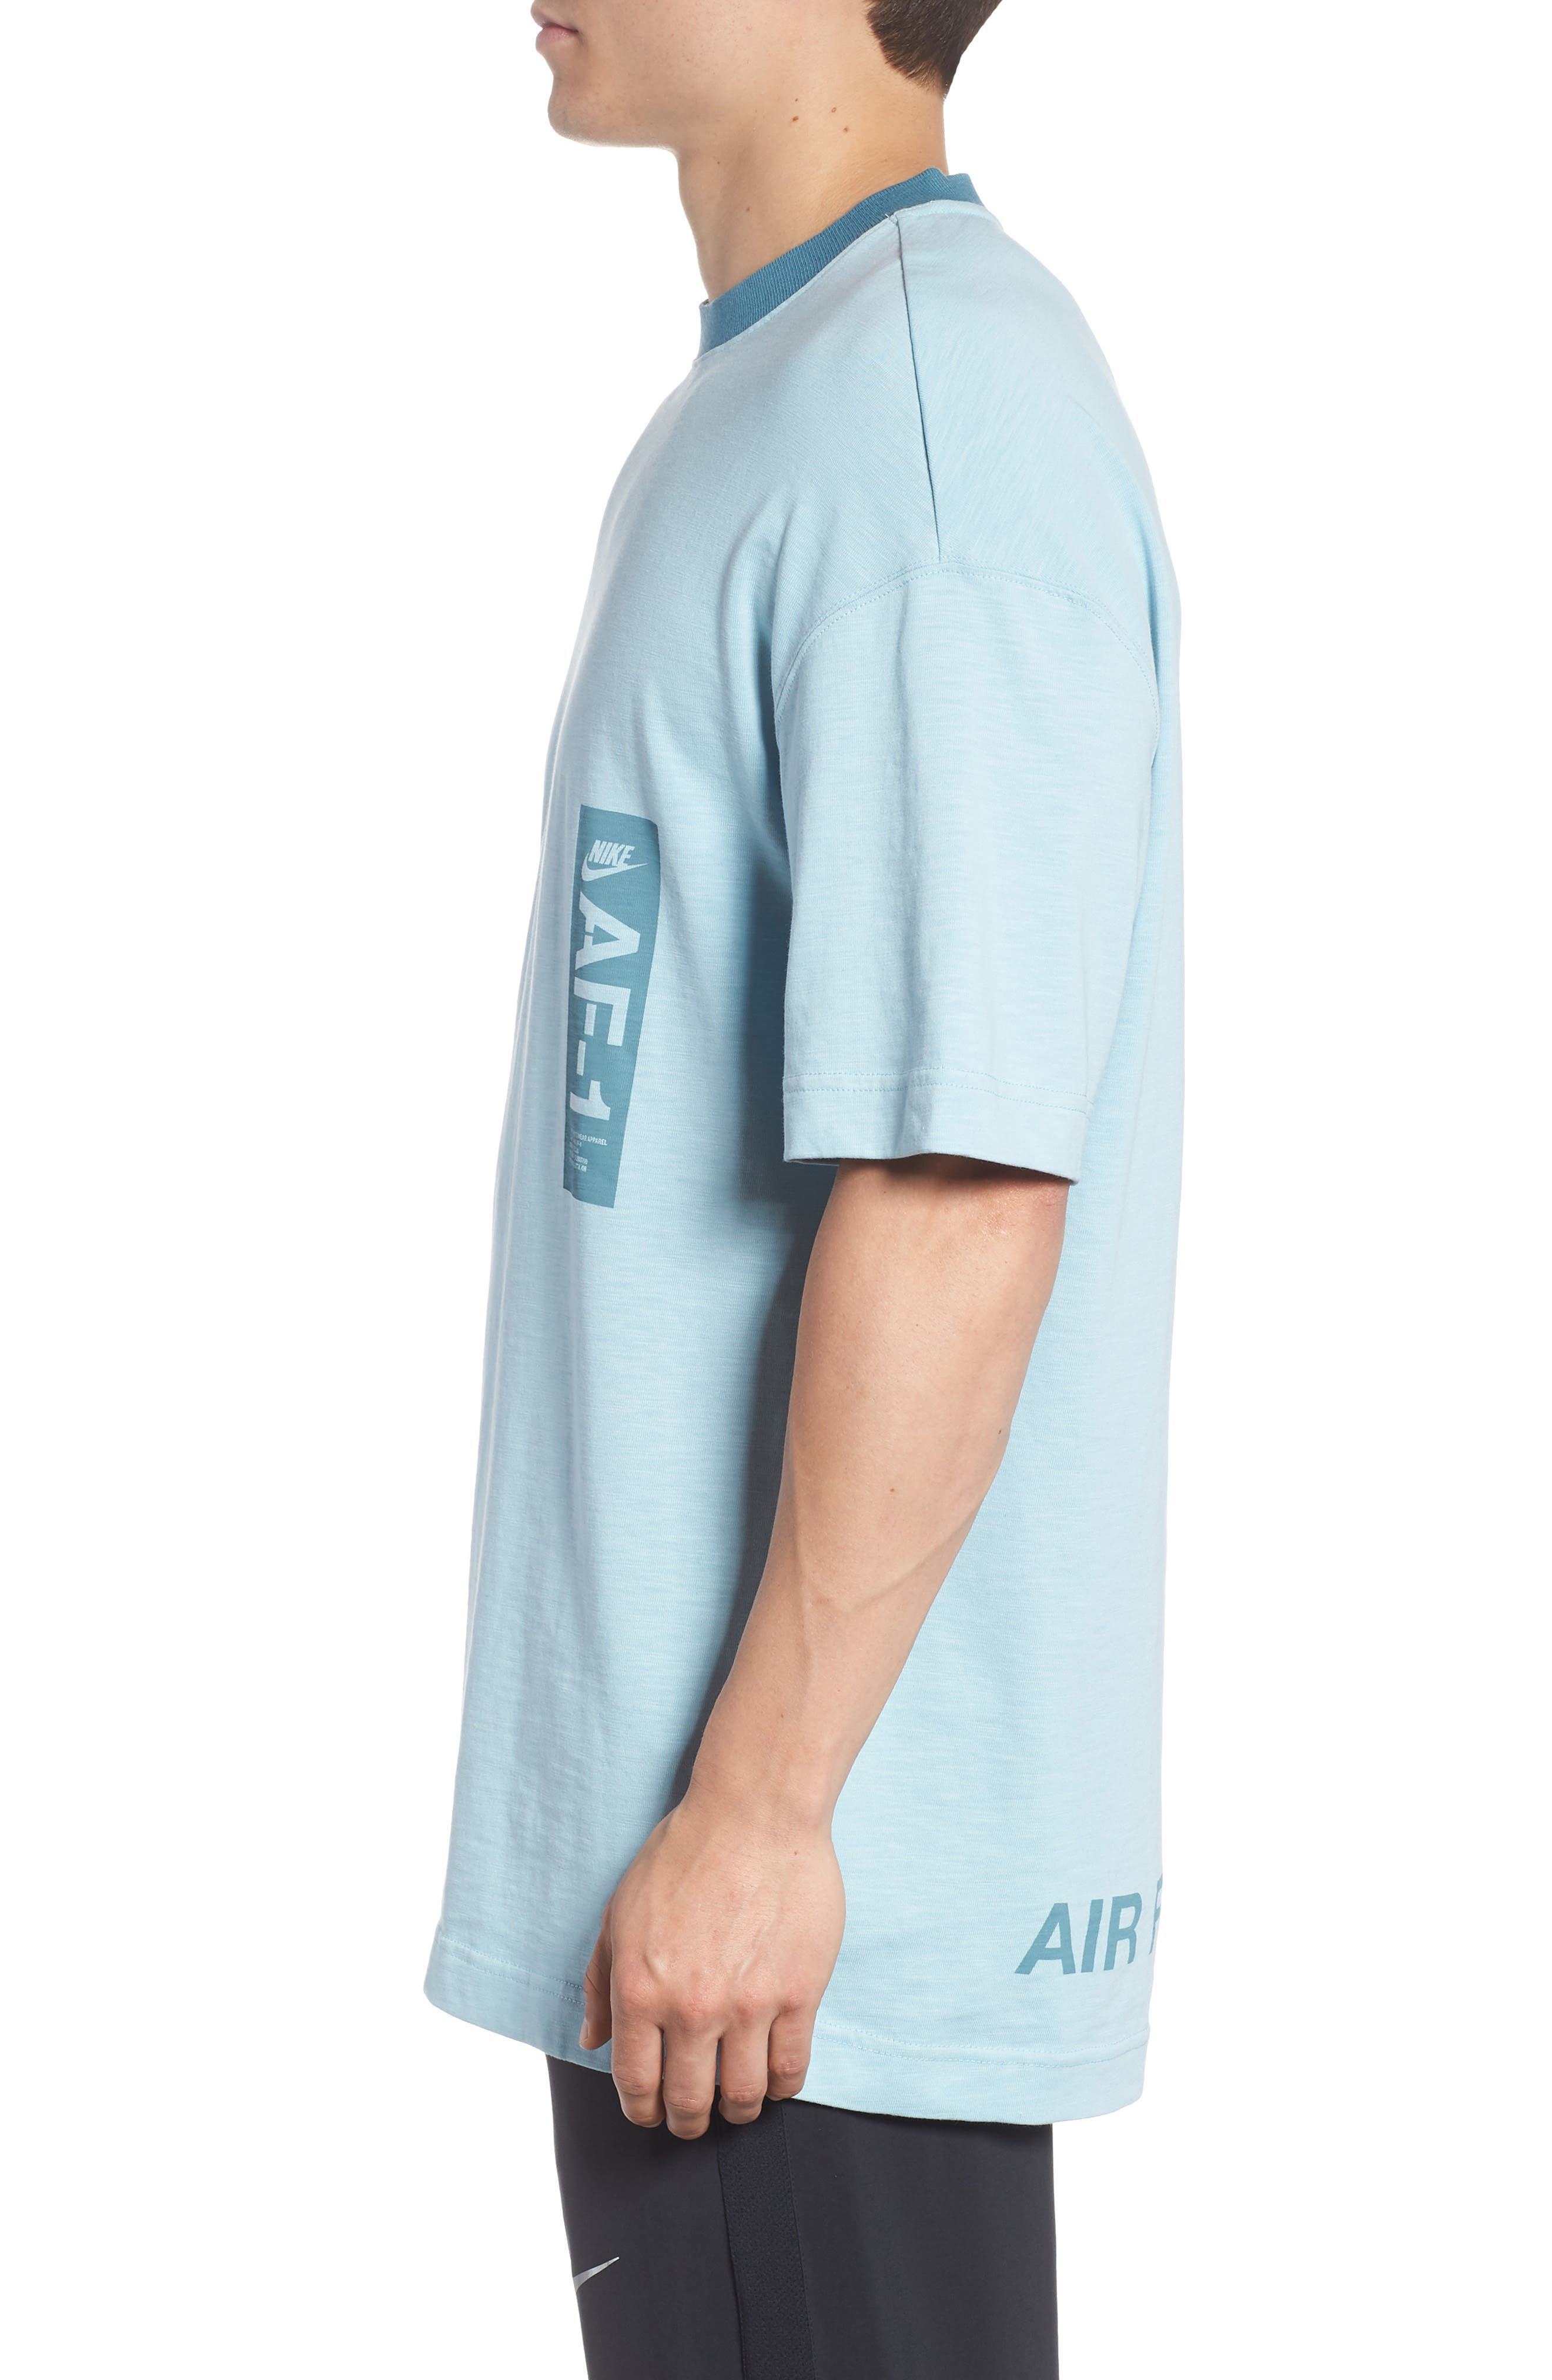 Sportswear AF1 Graphic T-Shirt,                             Alternate thumbnail 3, color,                             OCEAN BLISS/ NOISE AQUA